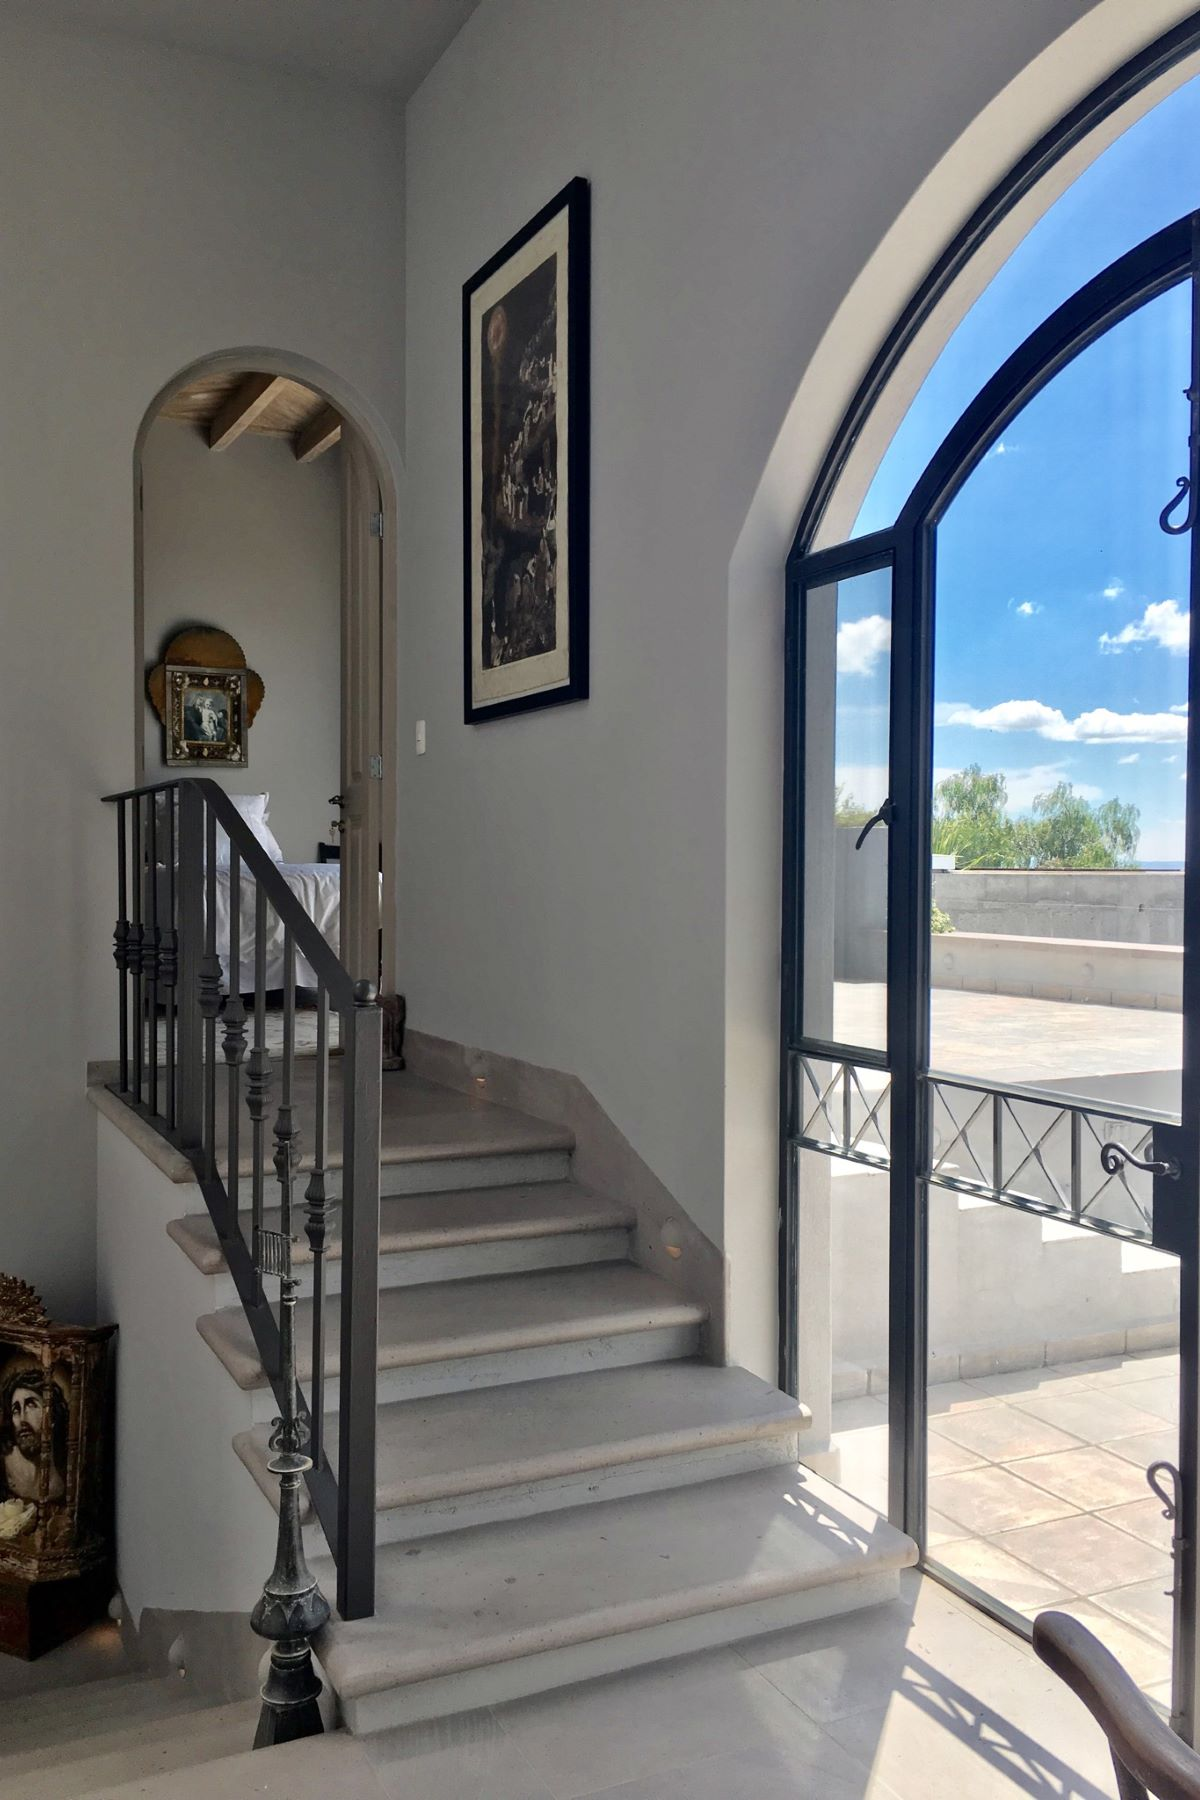 Additional photo for property listing at CASA DE LUZ Ojo De Agua, San Miguel De Allende, Guanajuato Mexico